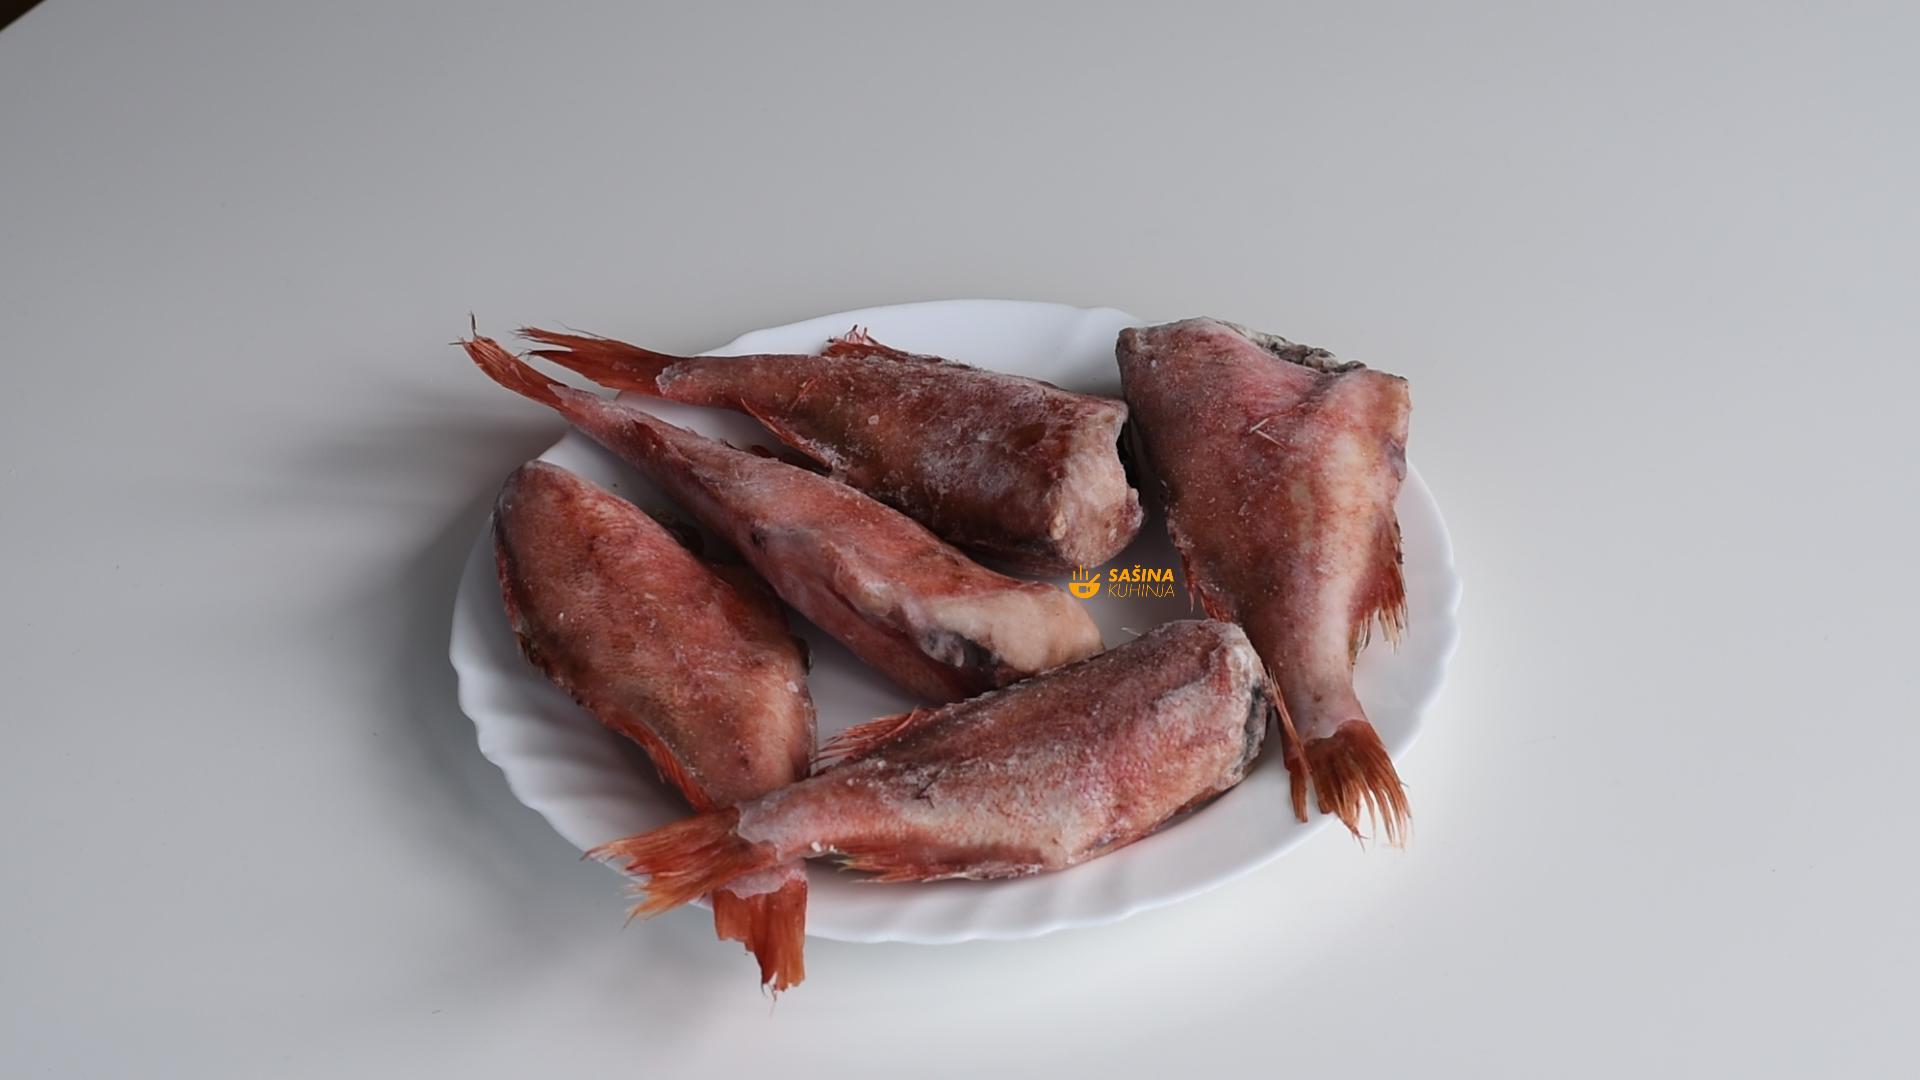 crveni bodečnjak riba